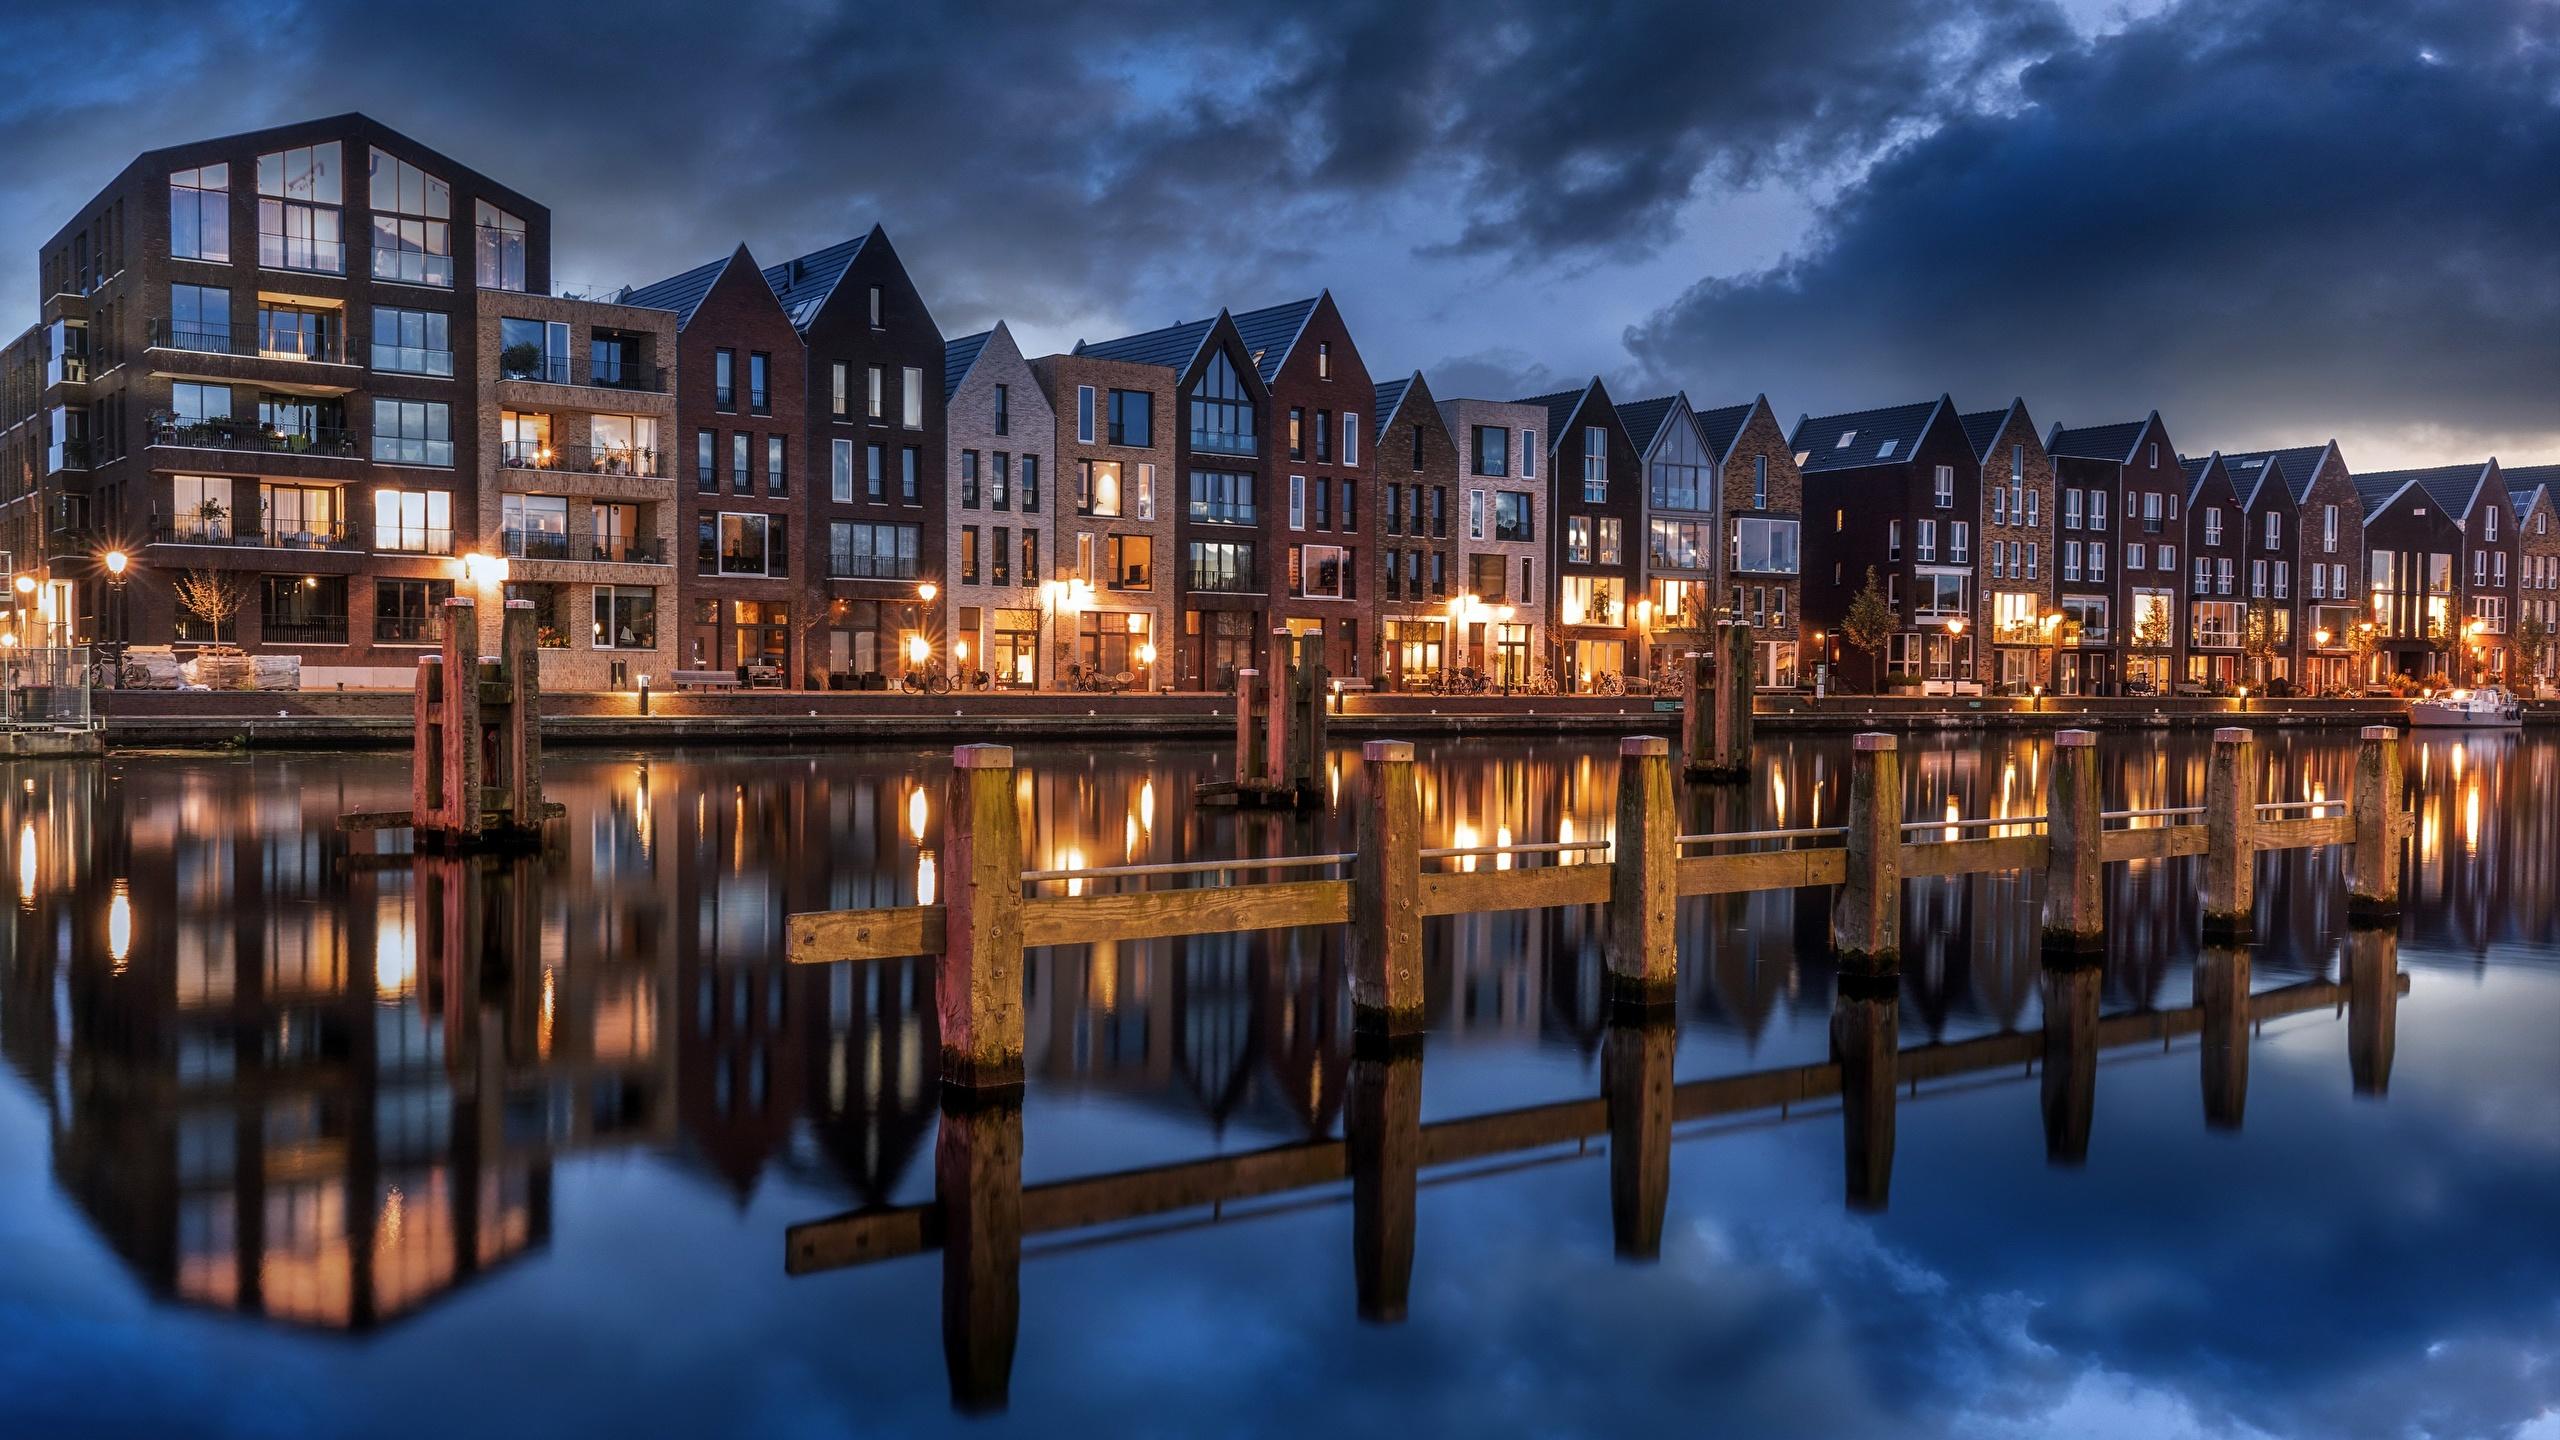 Обои нидерланды, Haarlem, Голландия. Города foto 8